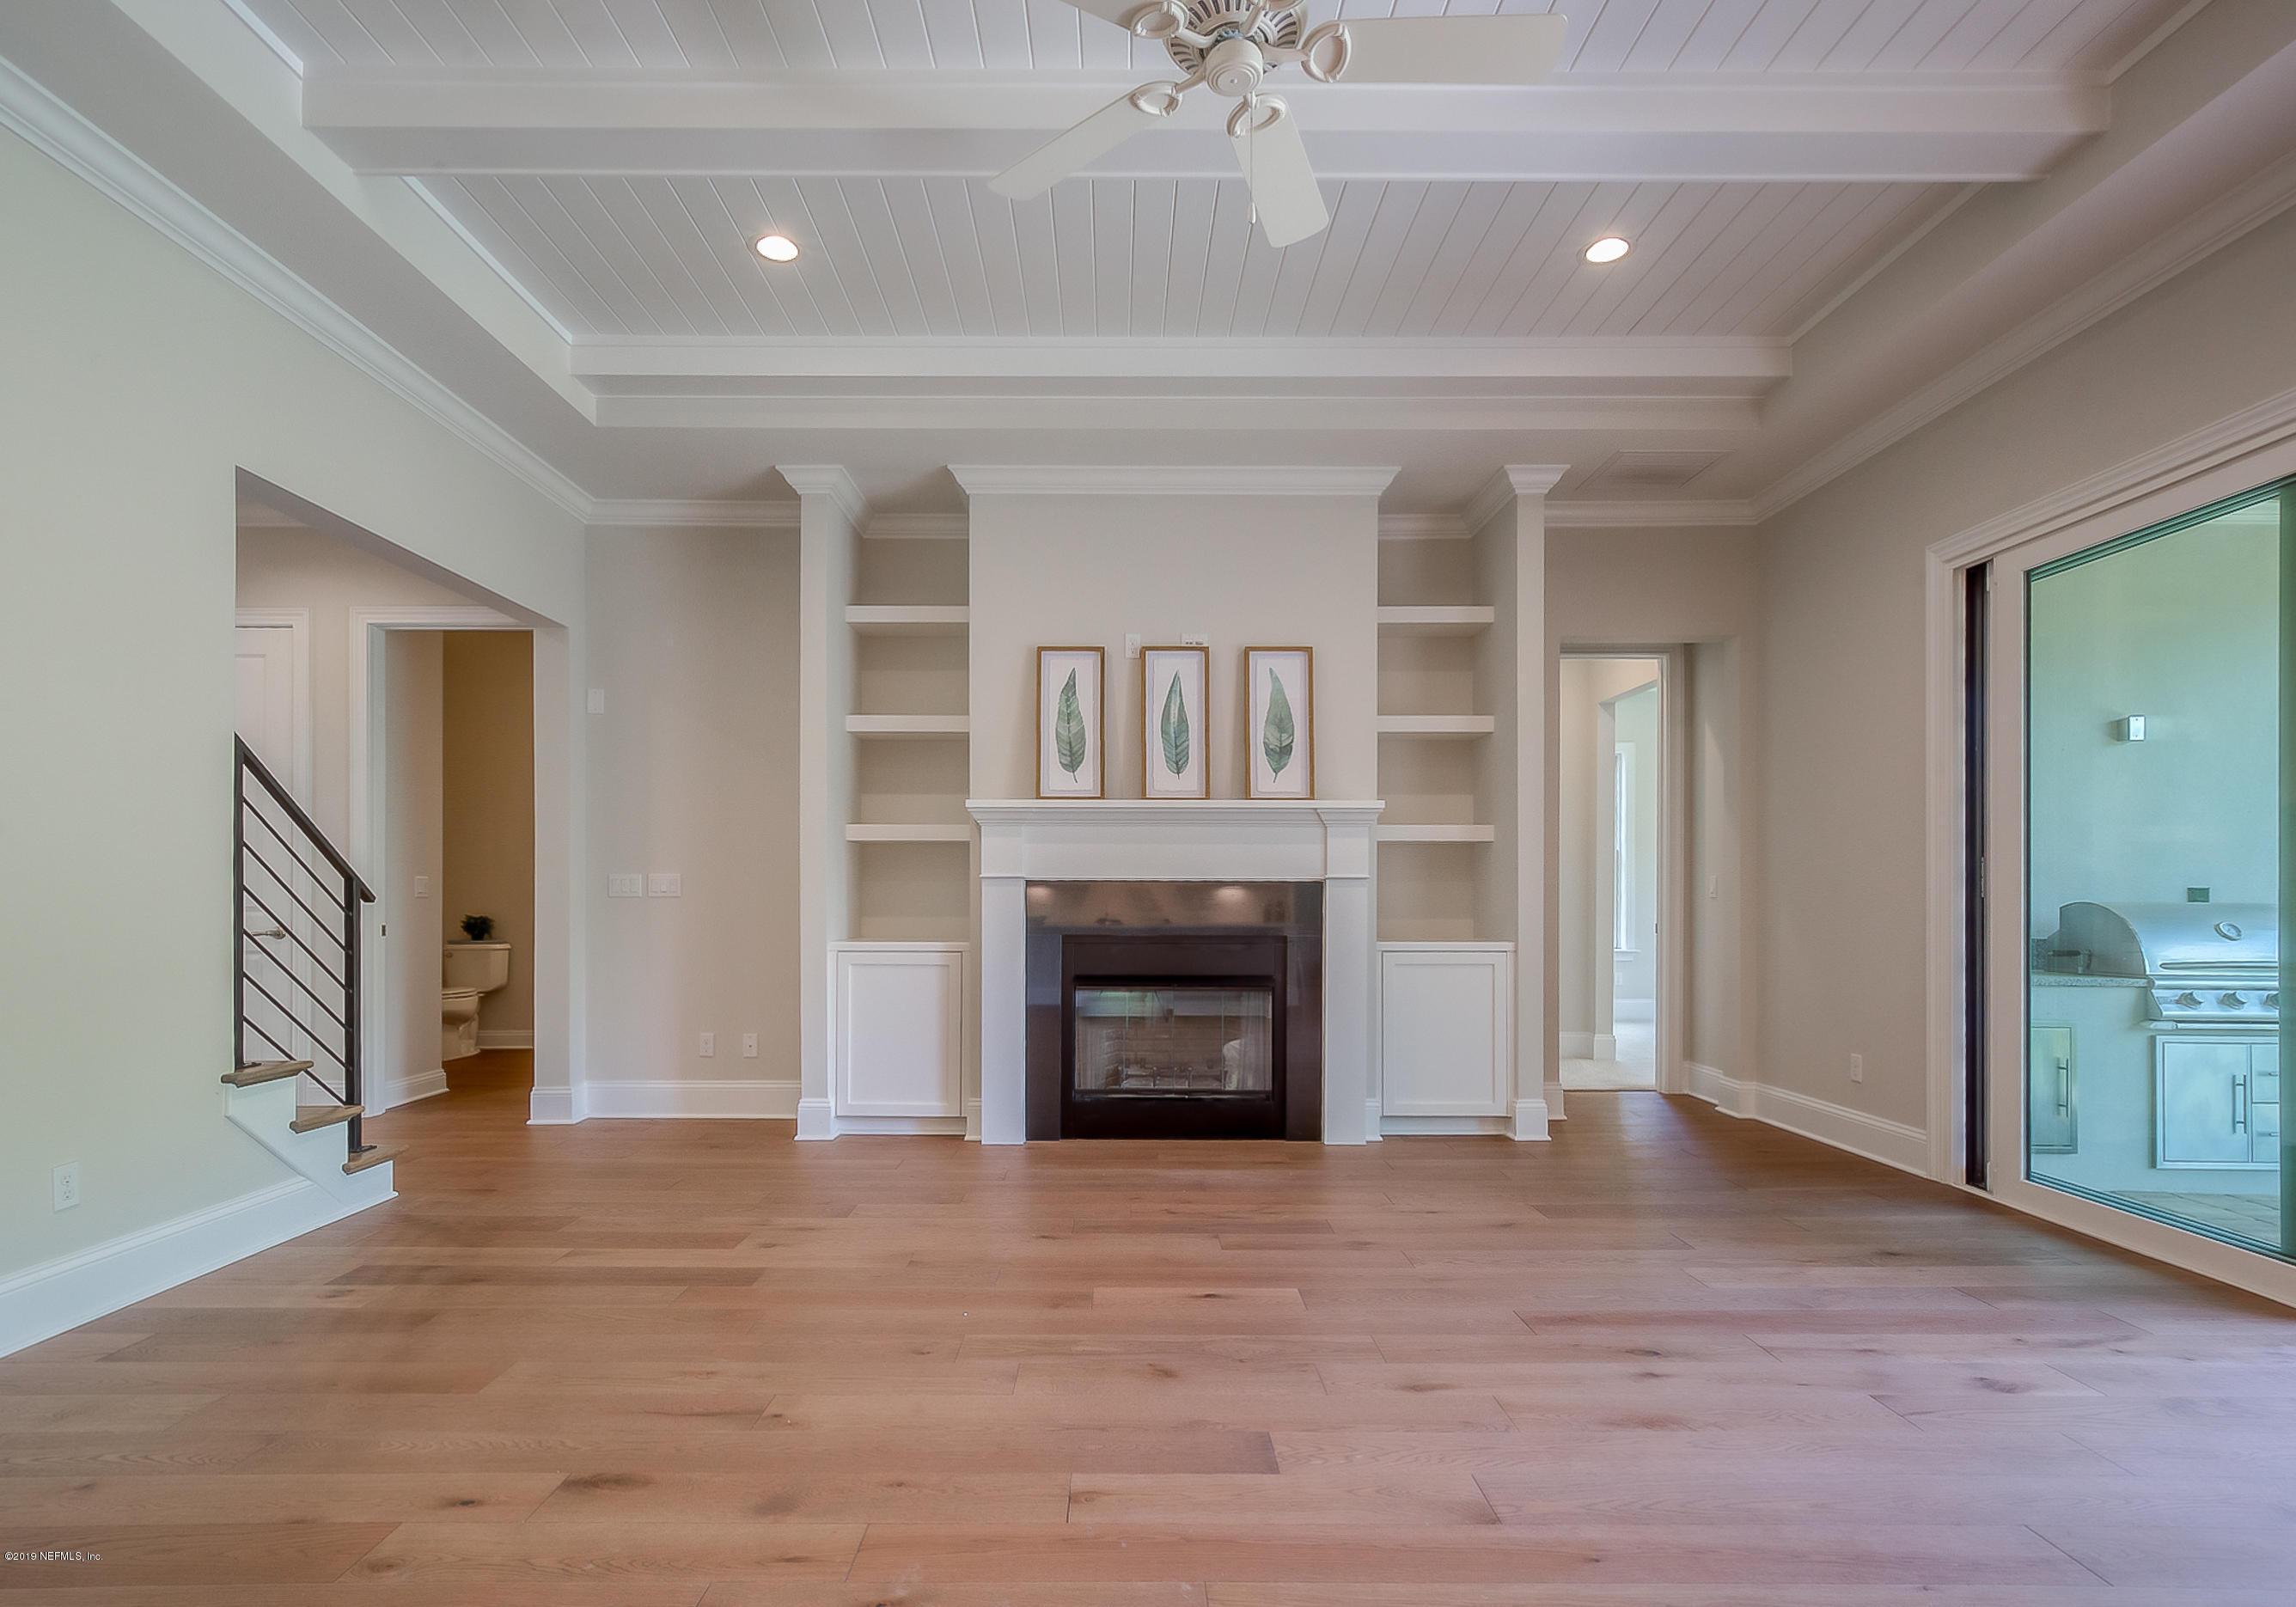 755 PROMENADE POINTE, ST AUGUSTINE, FLORIDA 32095, 4 Bedrooms Bedrooms, ,4 BathroomsBathrooms,Residential - single family,For sale,PROMENADE POINTE,988092